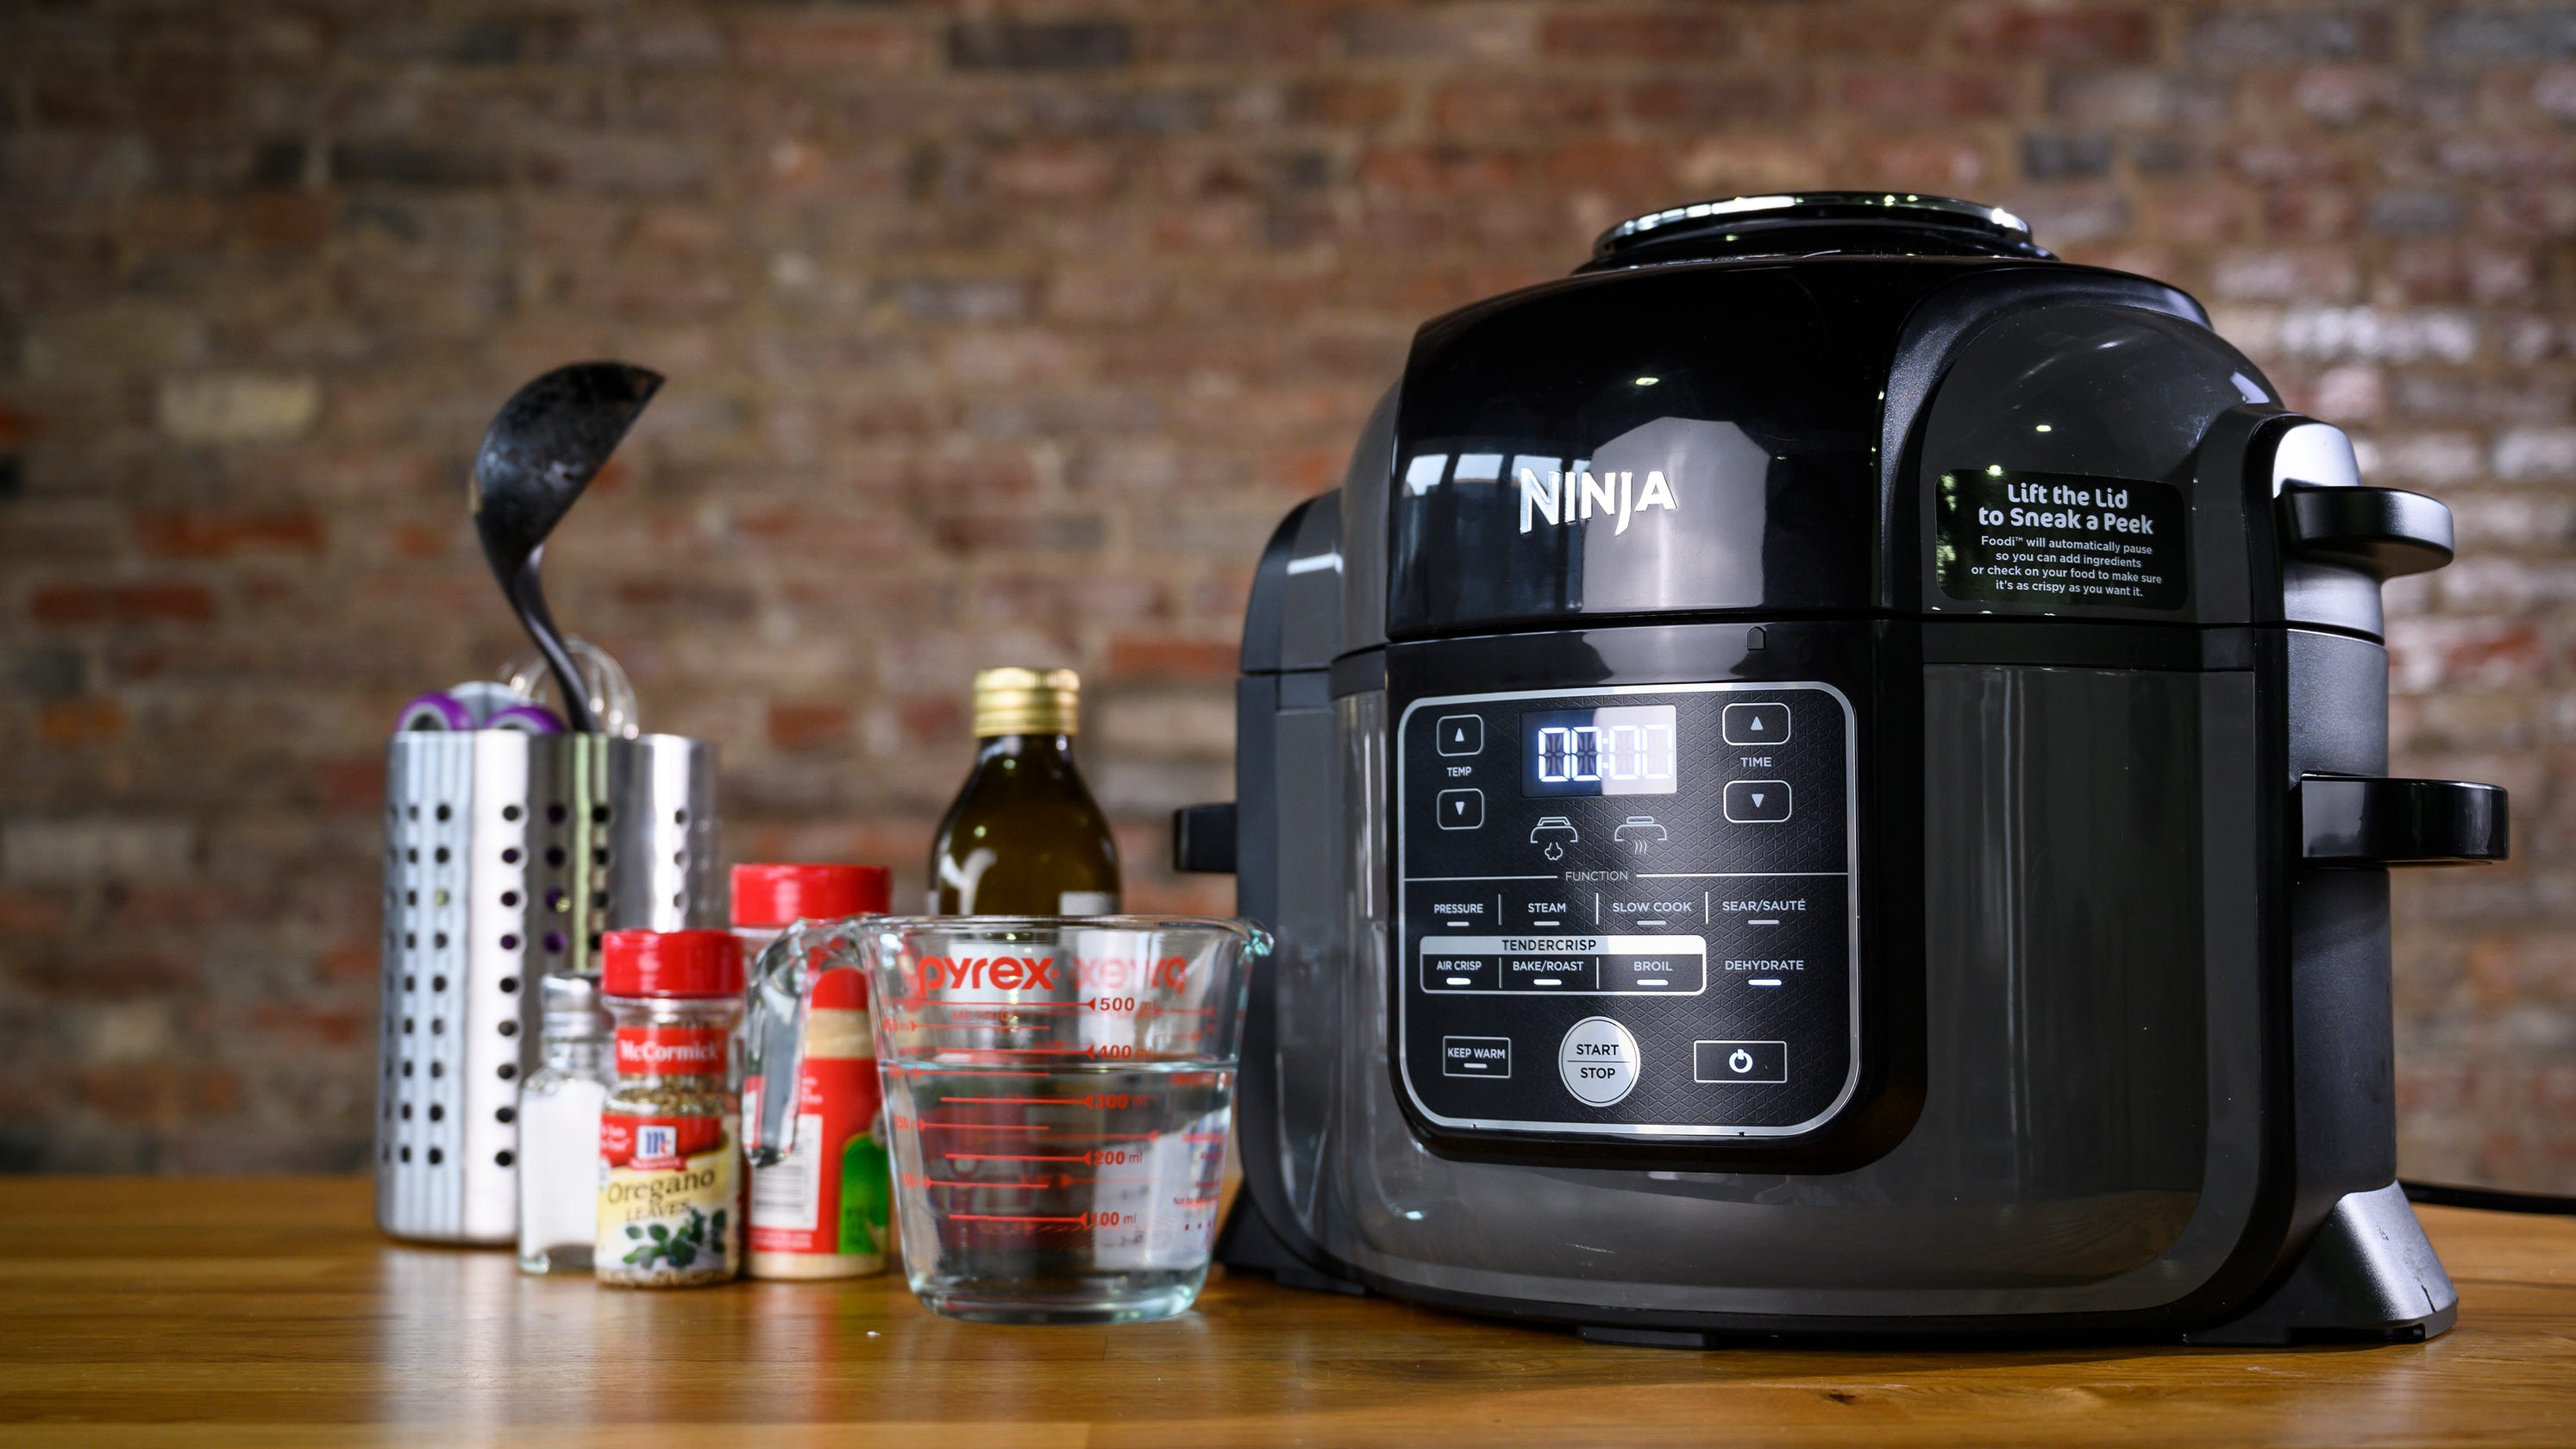 The Ninja Foodi Pressure Cooker And Air Fryer Is On Sale